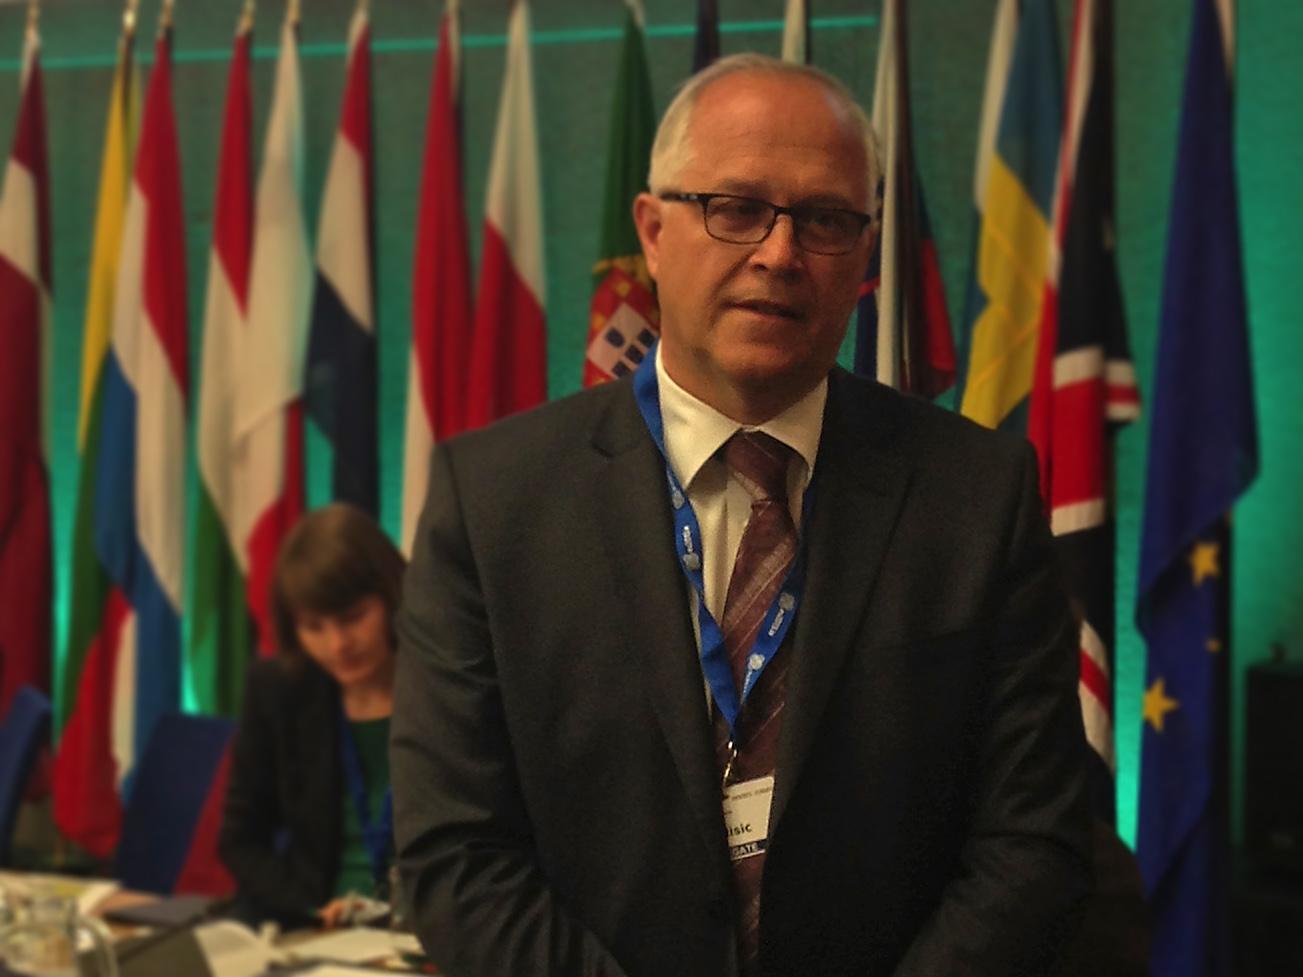 Direktor Ponikve - Ivica Plišić